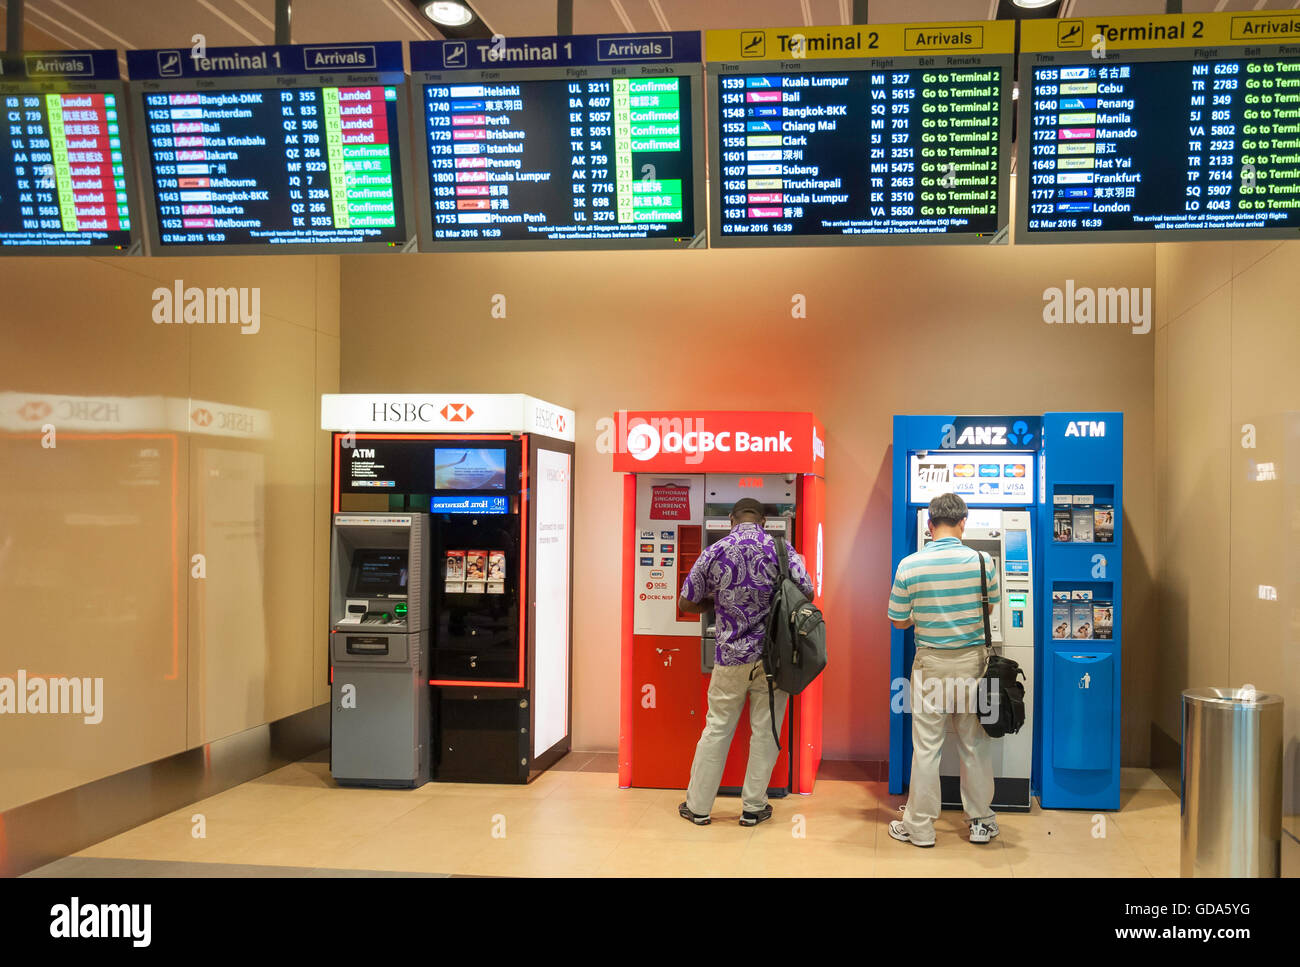 Cash machines in Arrivals Hall, Singapore Changi Airport, Changi, Singapore - Stock Image